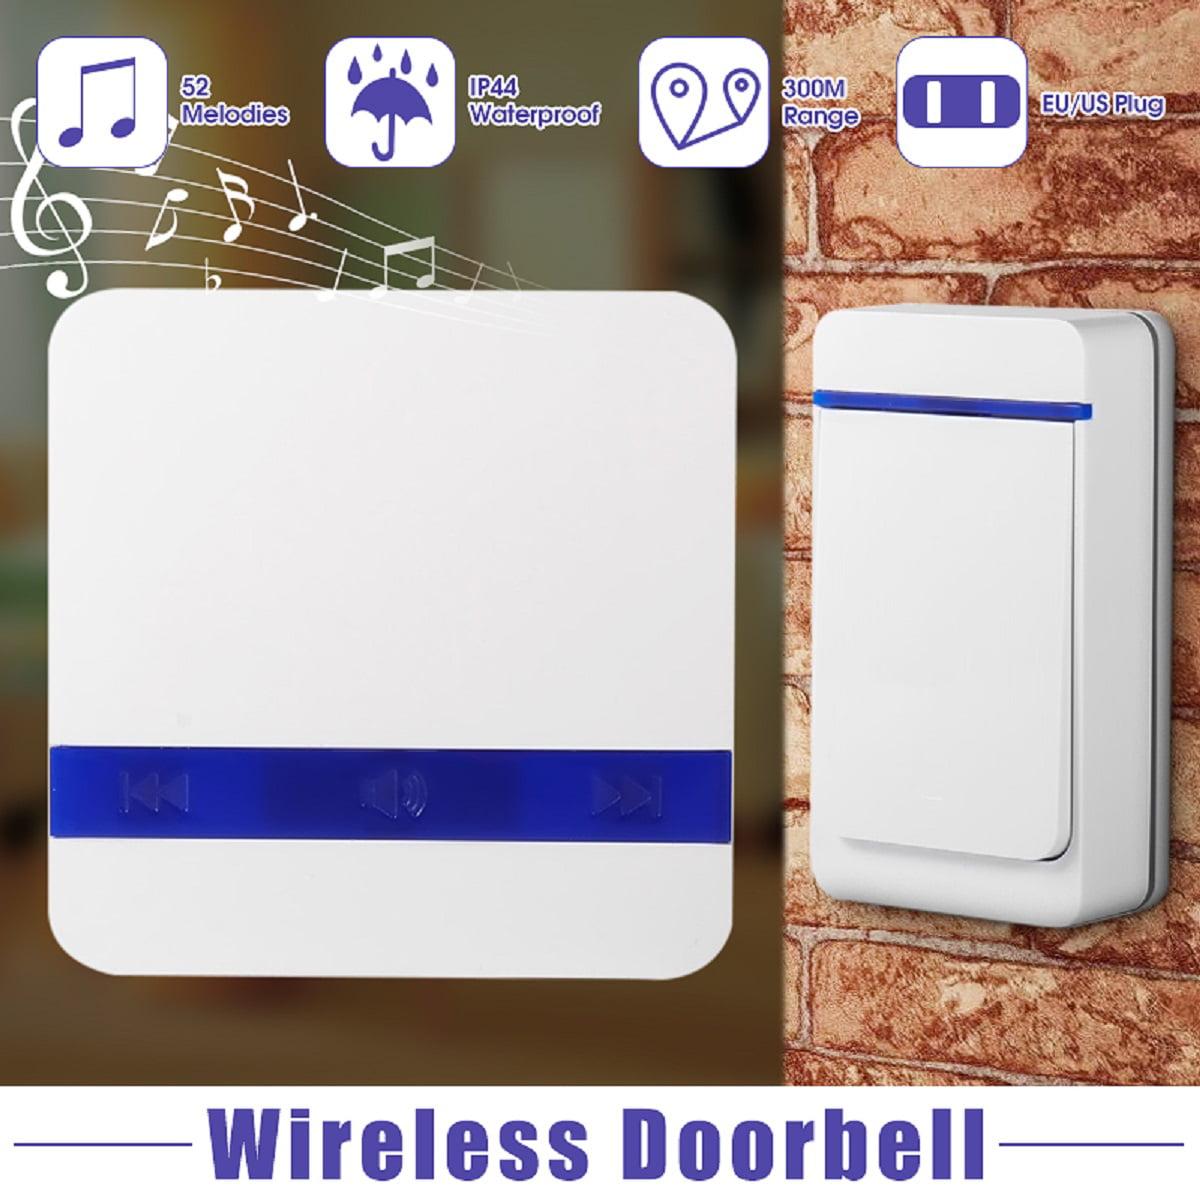 Waterproof Wireless Doorbell Ring Bell 52 Melodies Chime Songs Door Bell Alarm